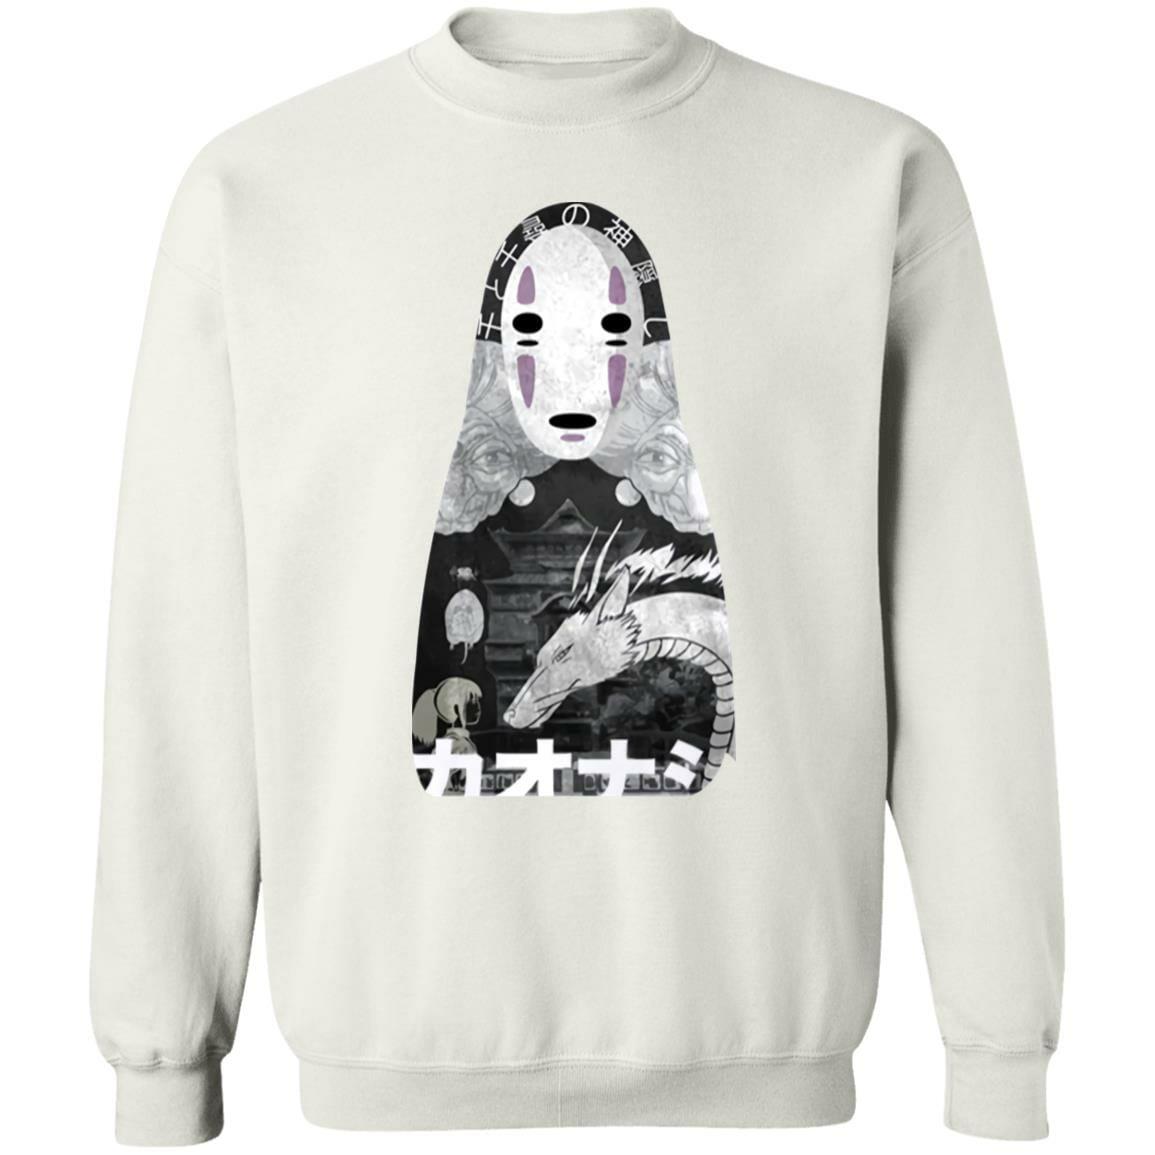 Spirited Away Kaonashi Cutout Black Sweatshirt